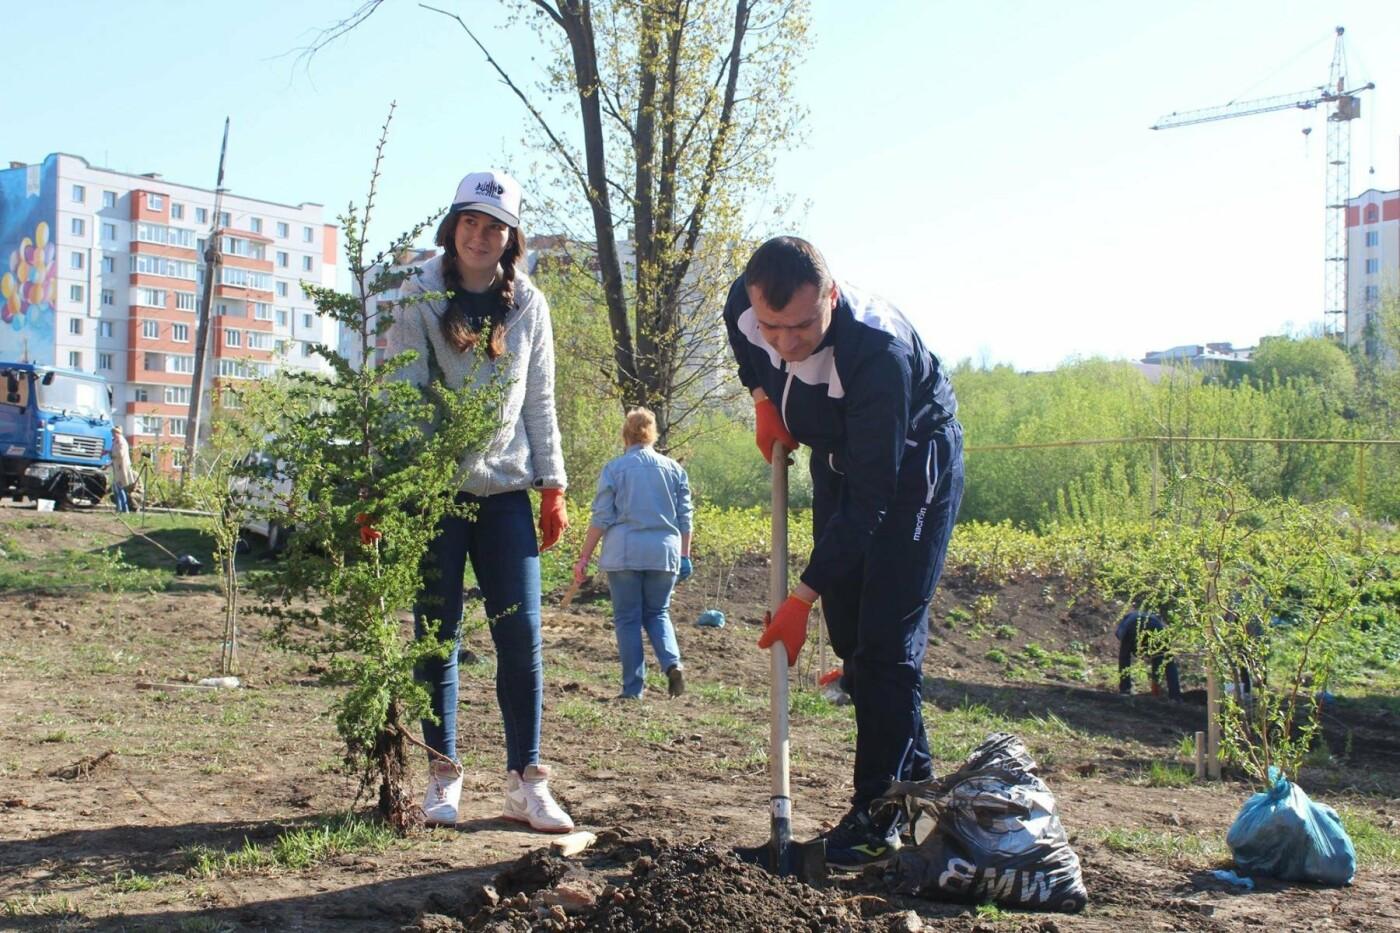 У Хмельницькому в День довкілля висаджено сто п'ятдесят дерев, фото-2